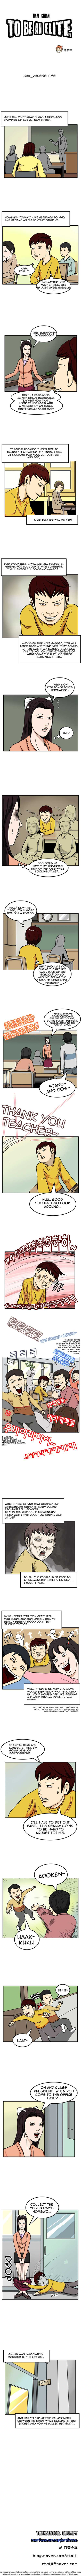 Nam Gi-han To be an Elite 4 Page 1